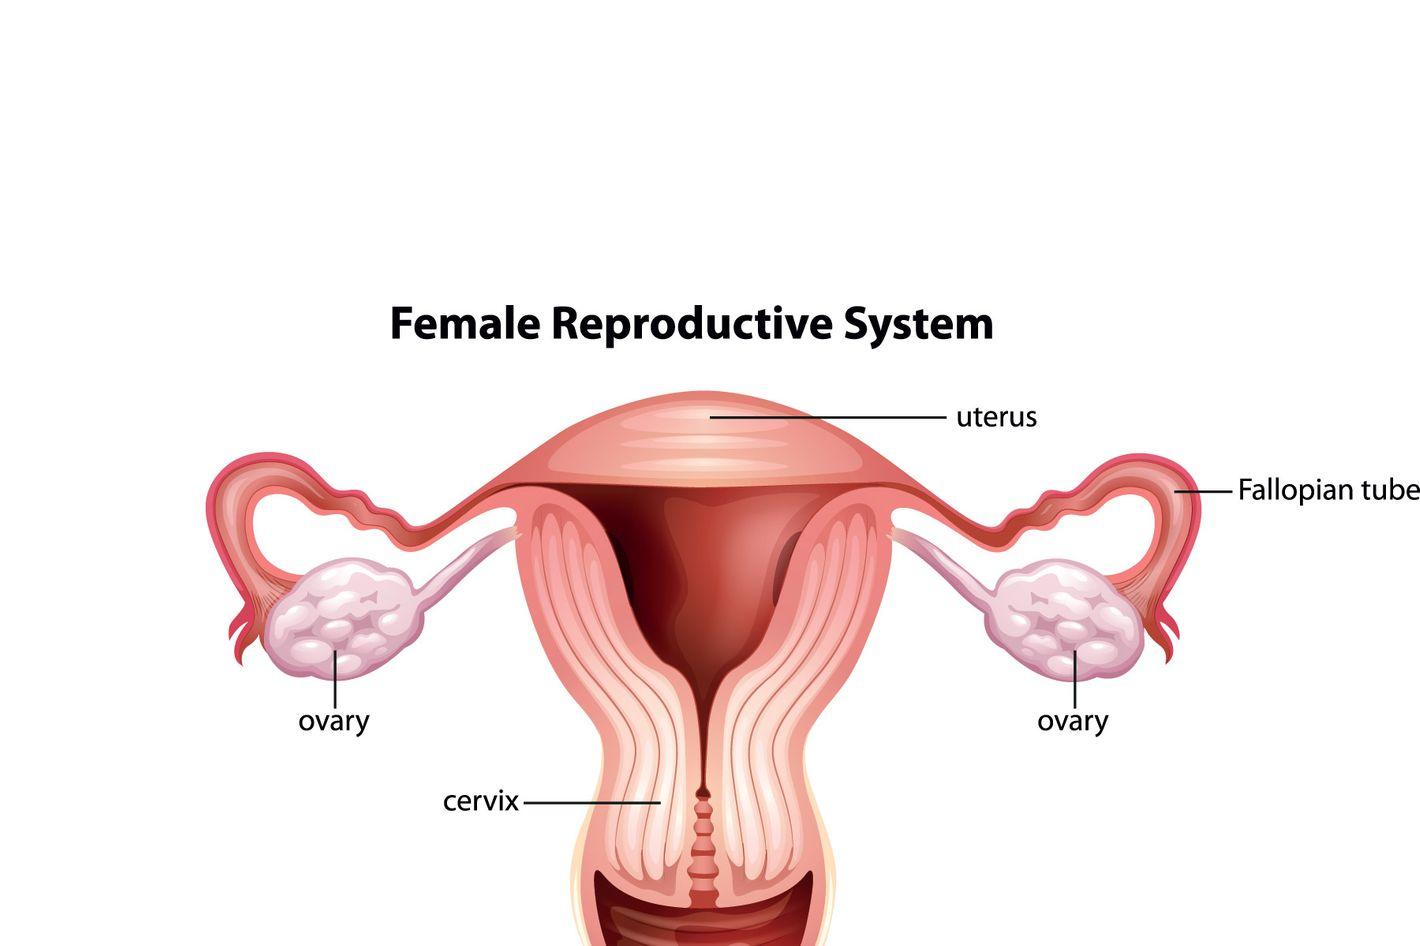 Is My Cervix Weird-Looking?